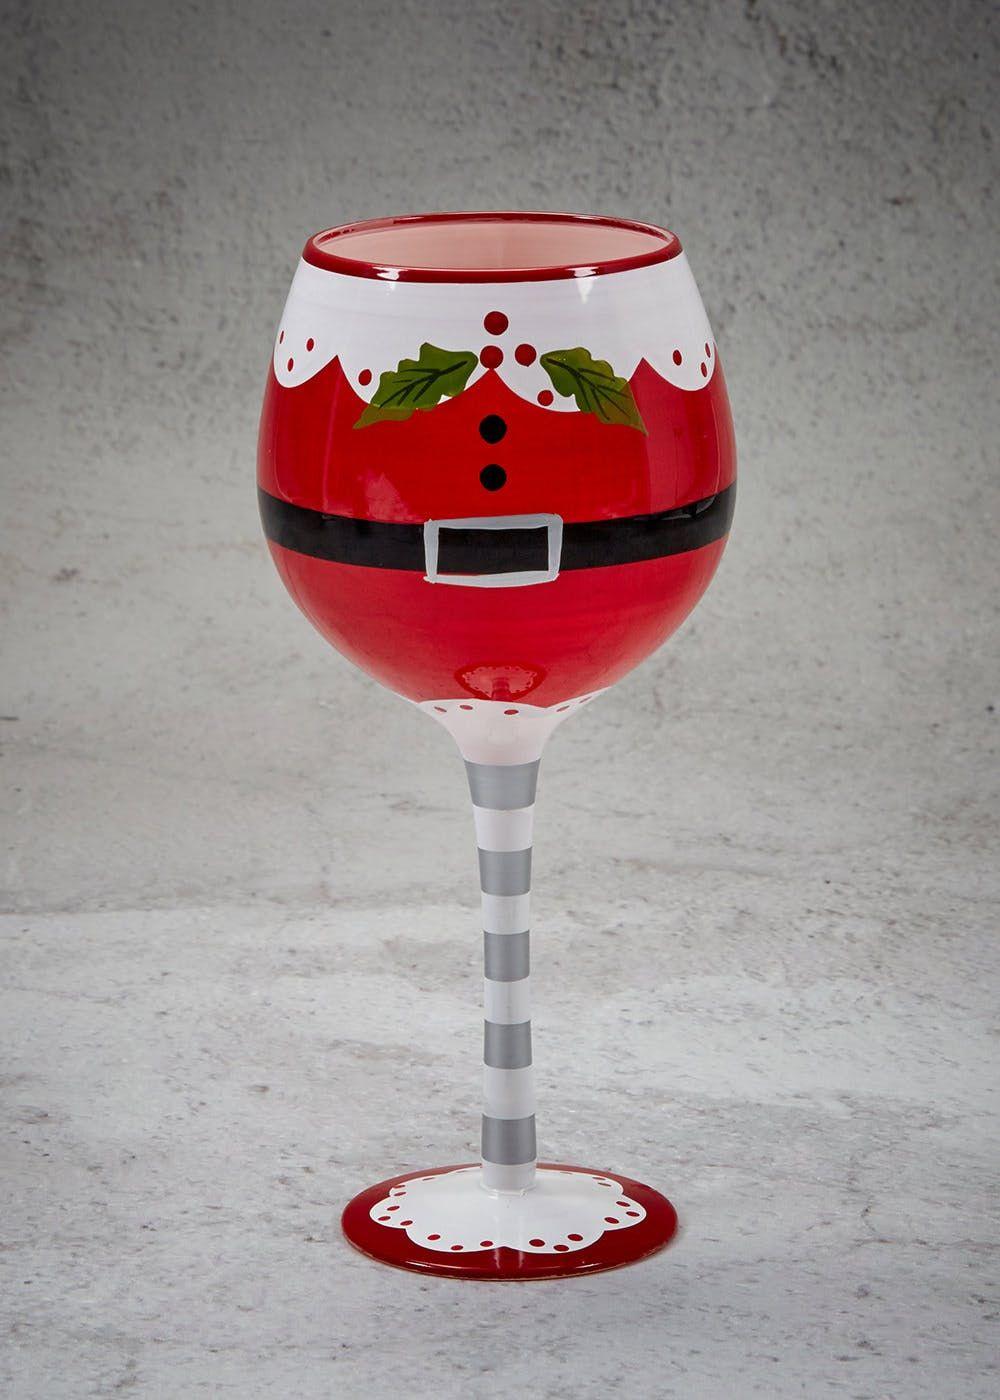 Whiskey Beer Gin Glasses Drinking Glasses Tumbler Fluted Glass Christmas Wine Glasses Wine Glass Christmas Wine